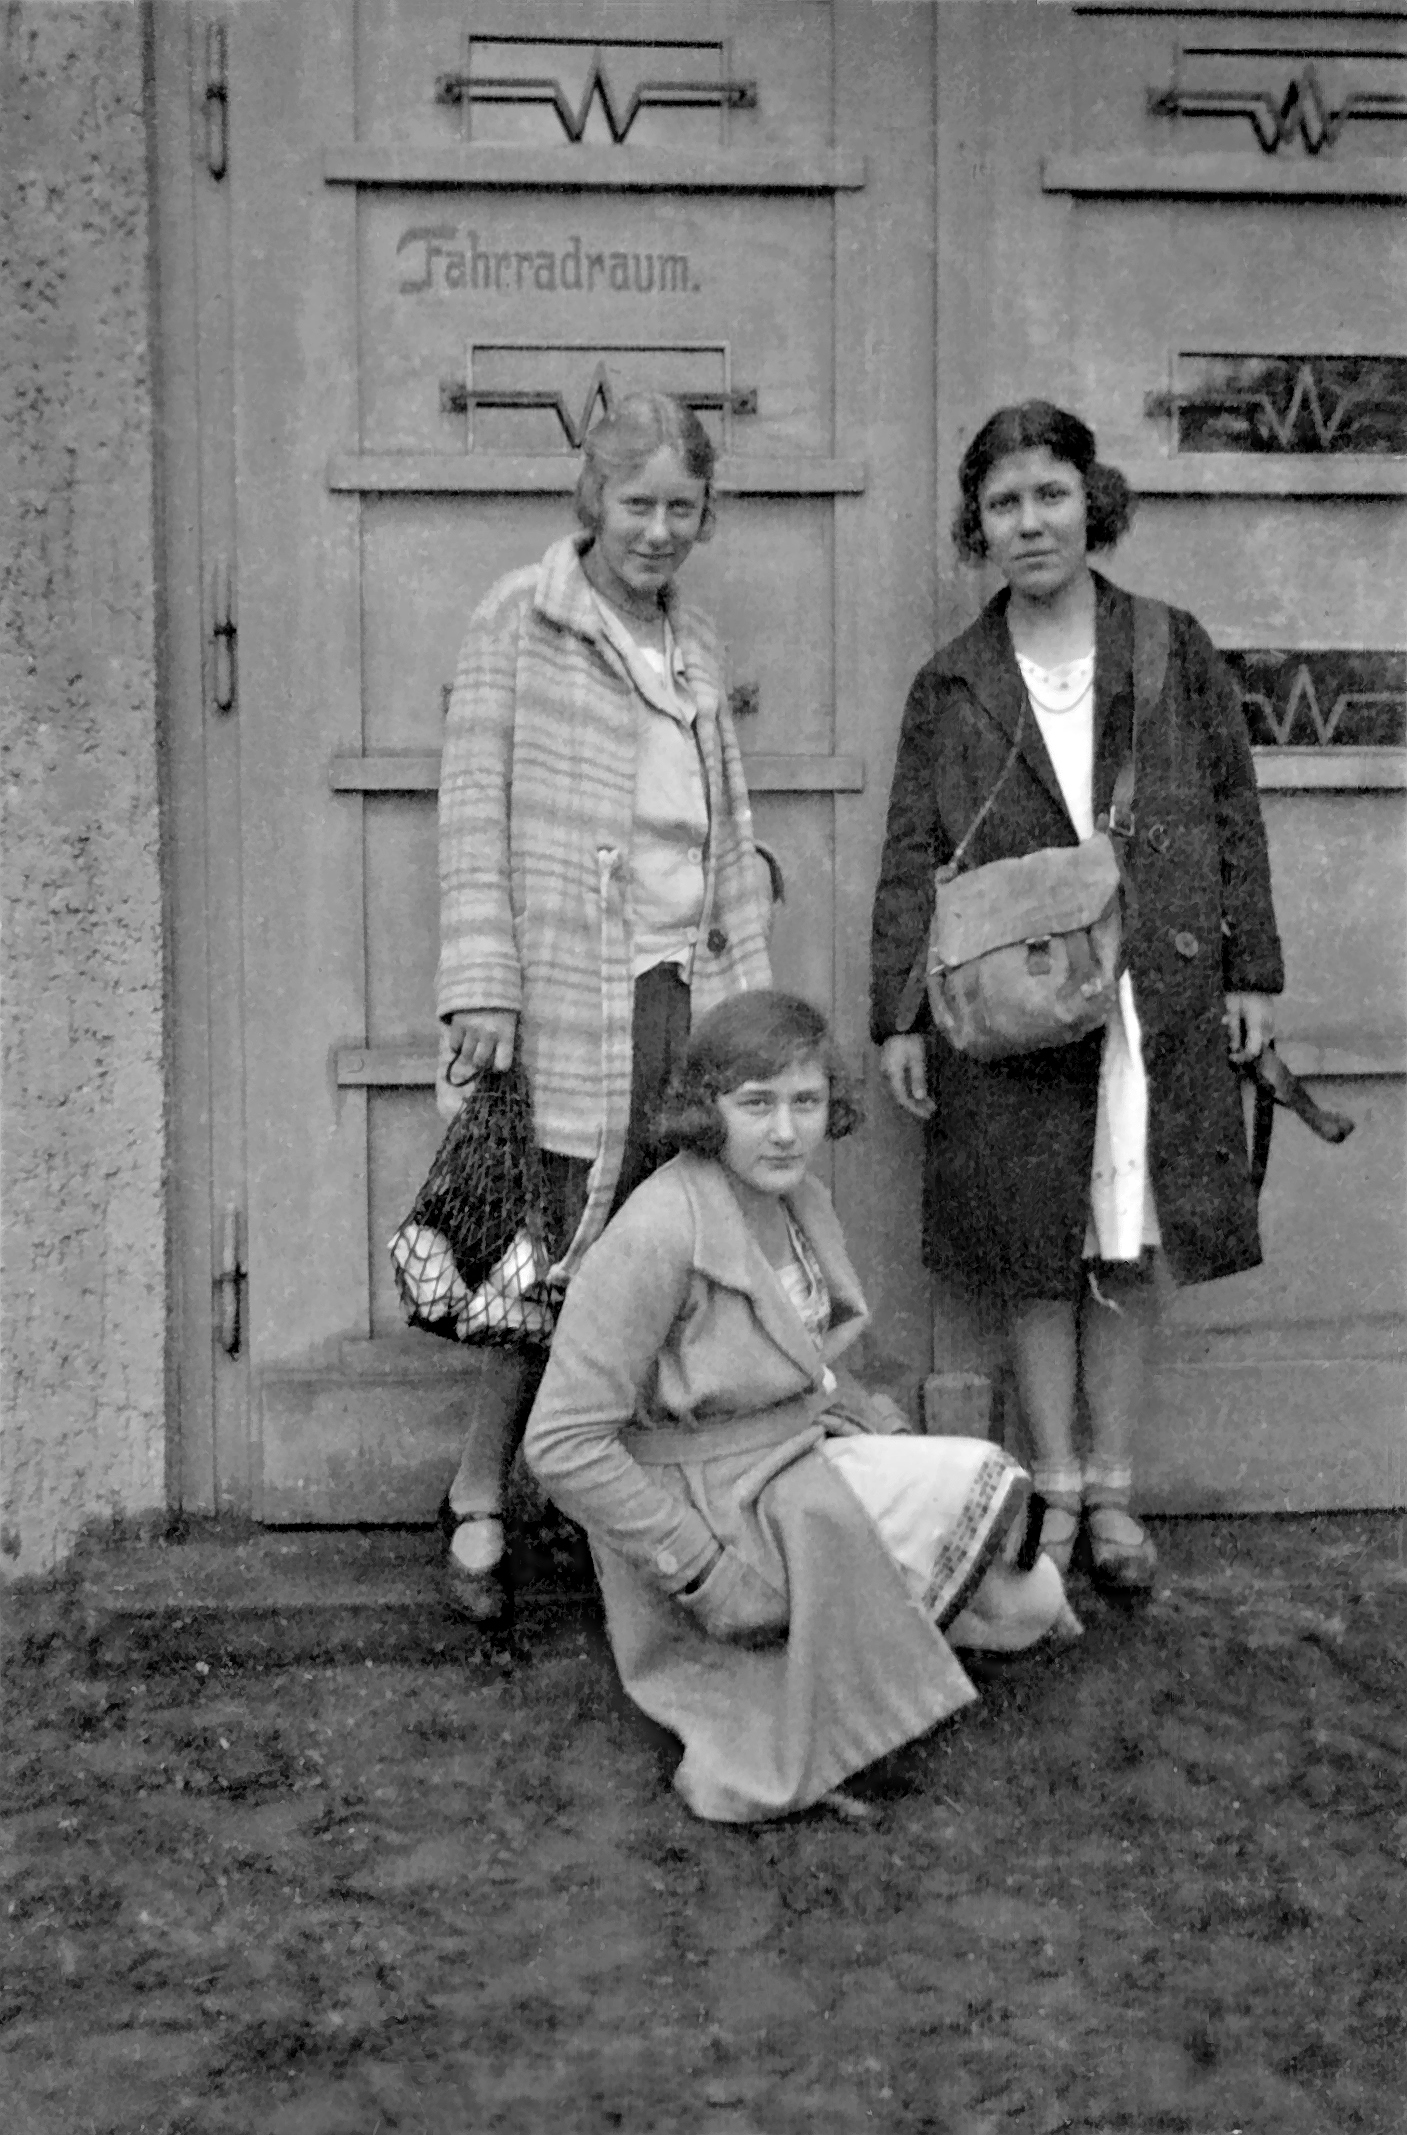 Vor dem Fahrradraum, 1930